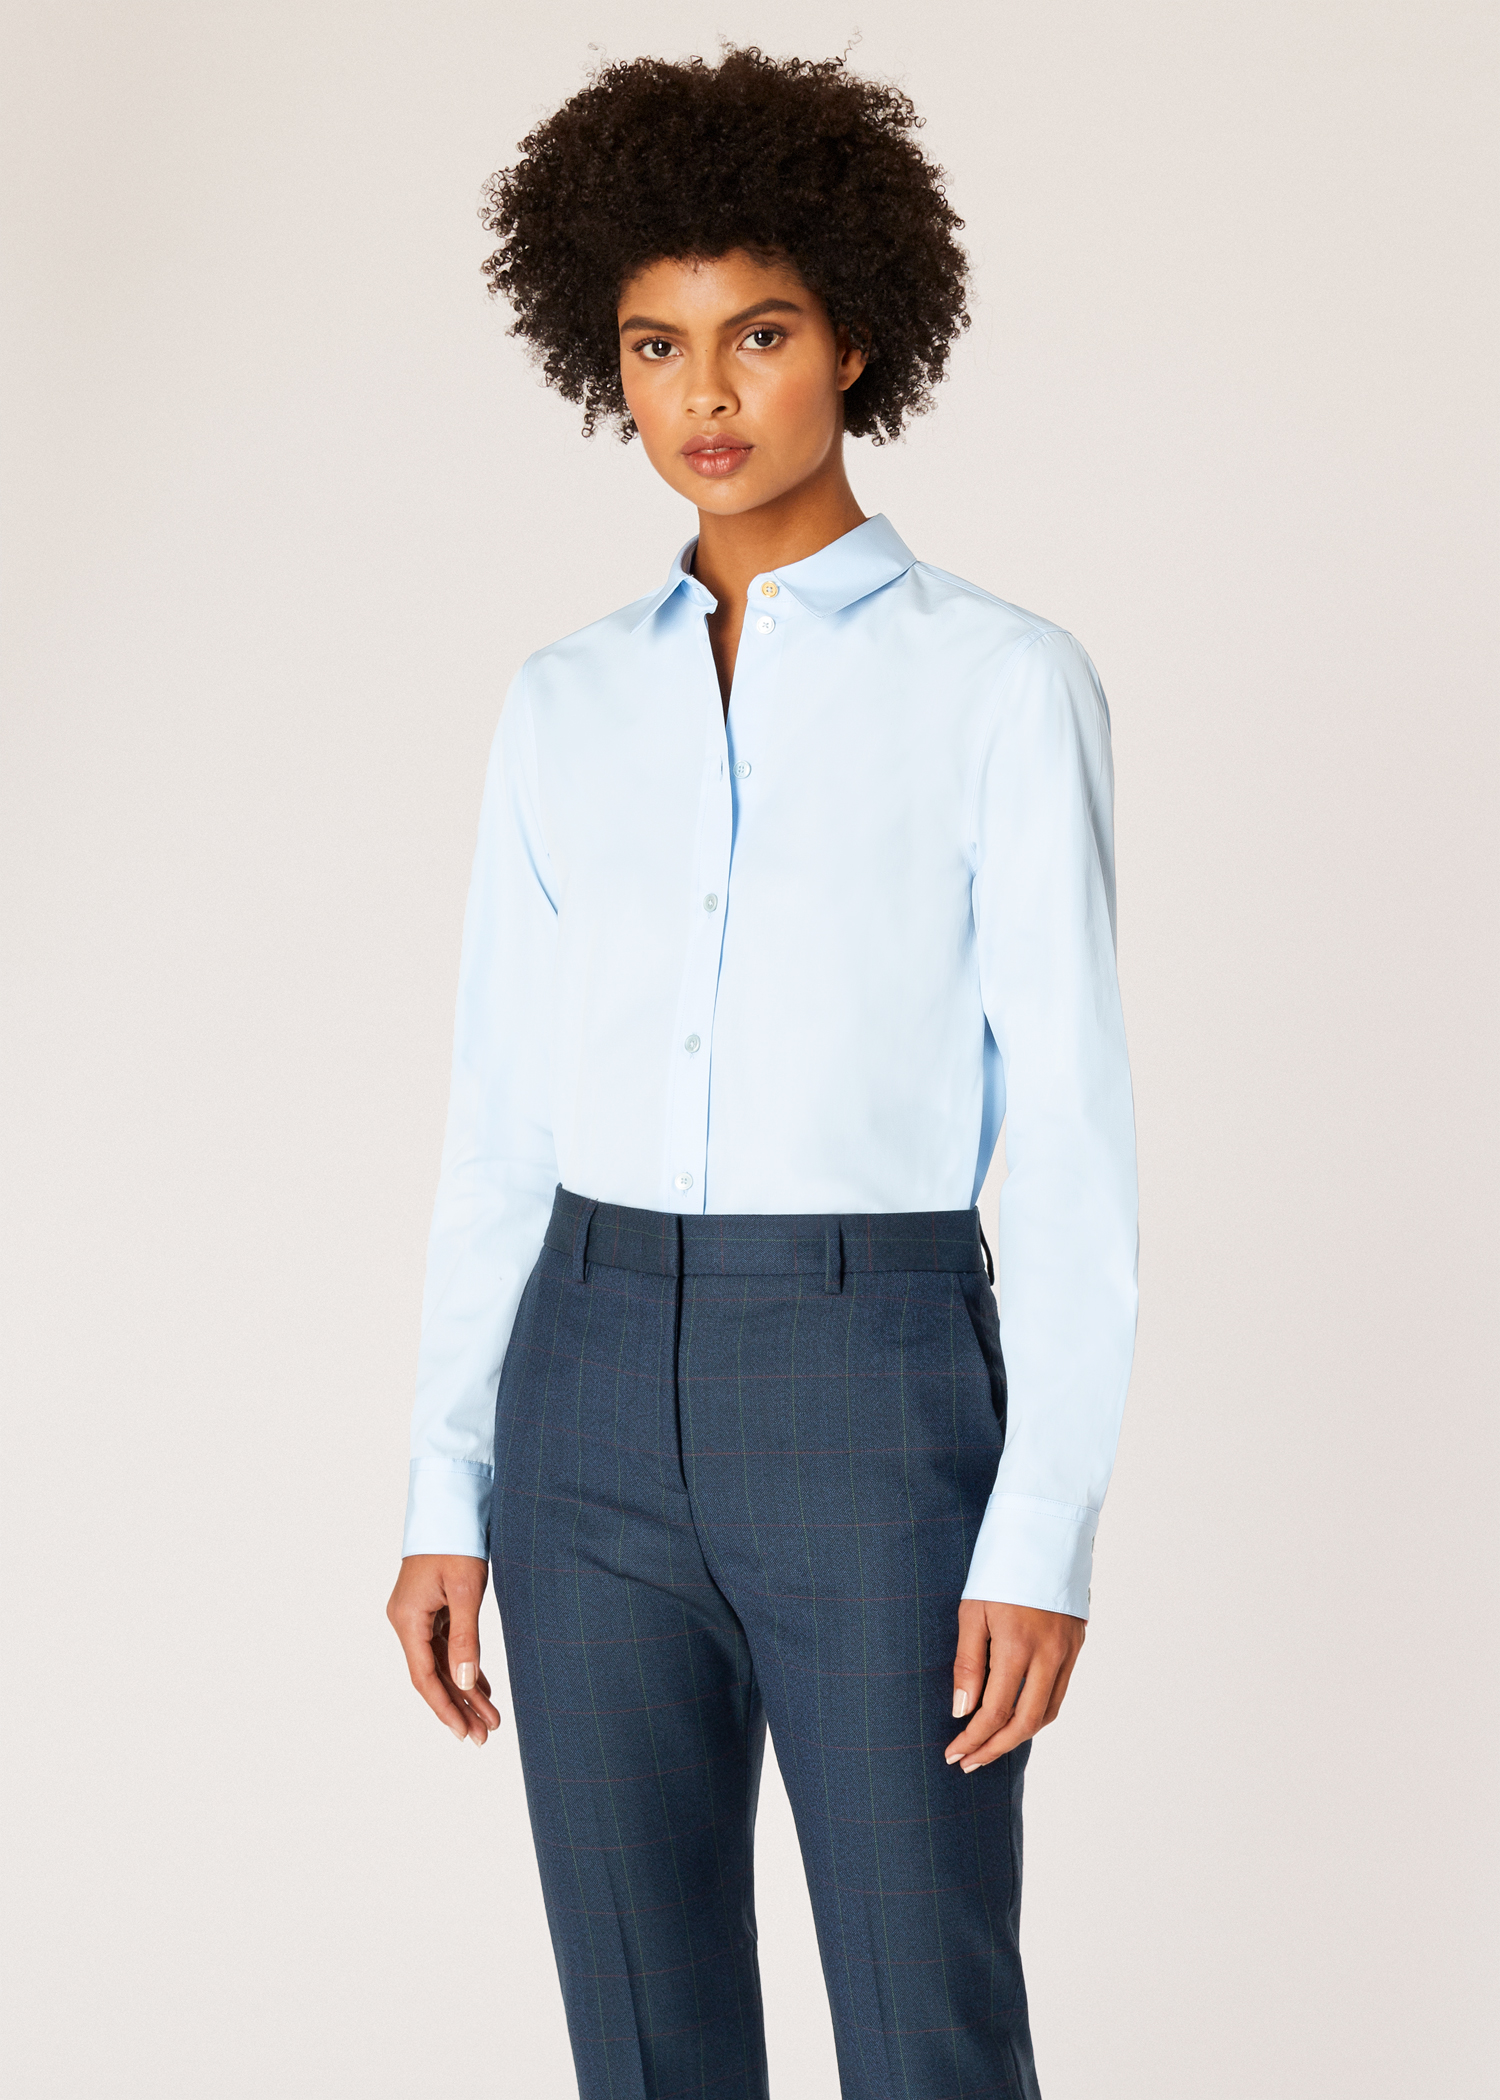 bec6e3f6c18f Model front close up- Women's Slim-Fit Light Blue Cotton Shirt With 'Artist